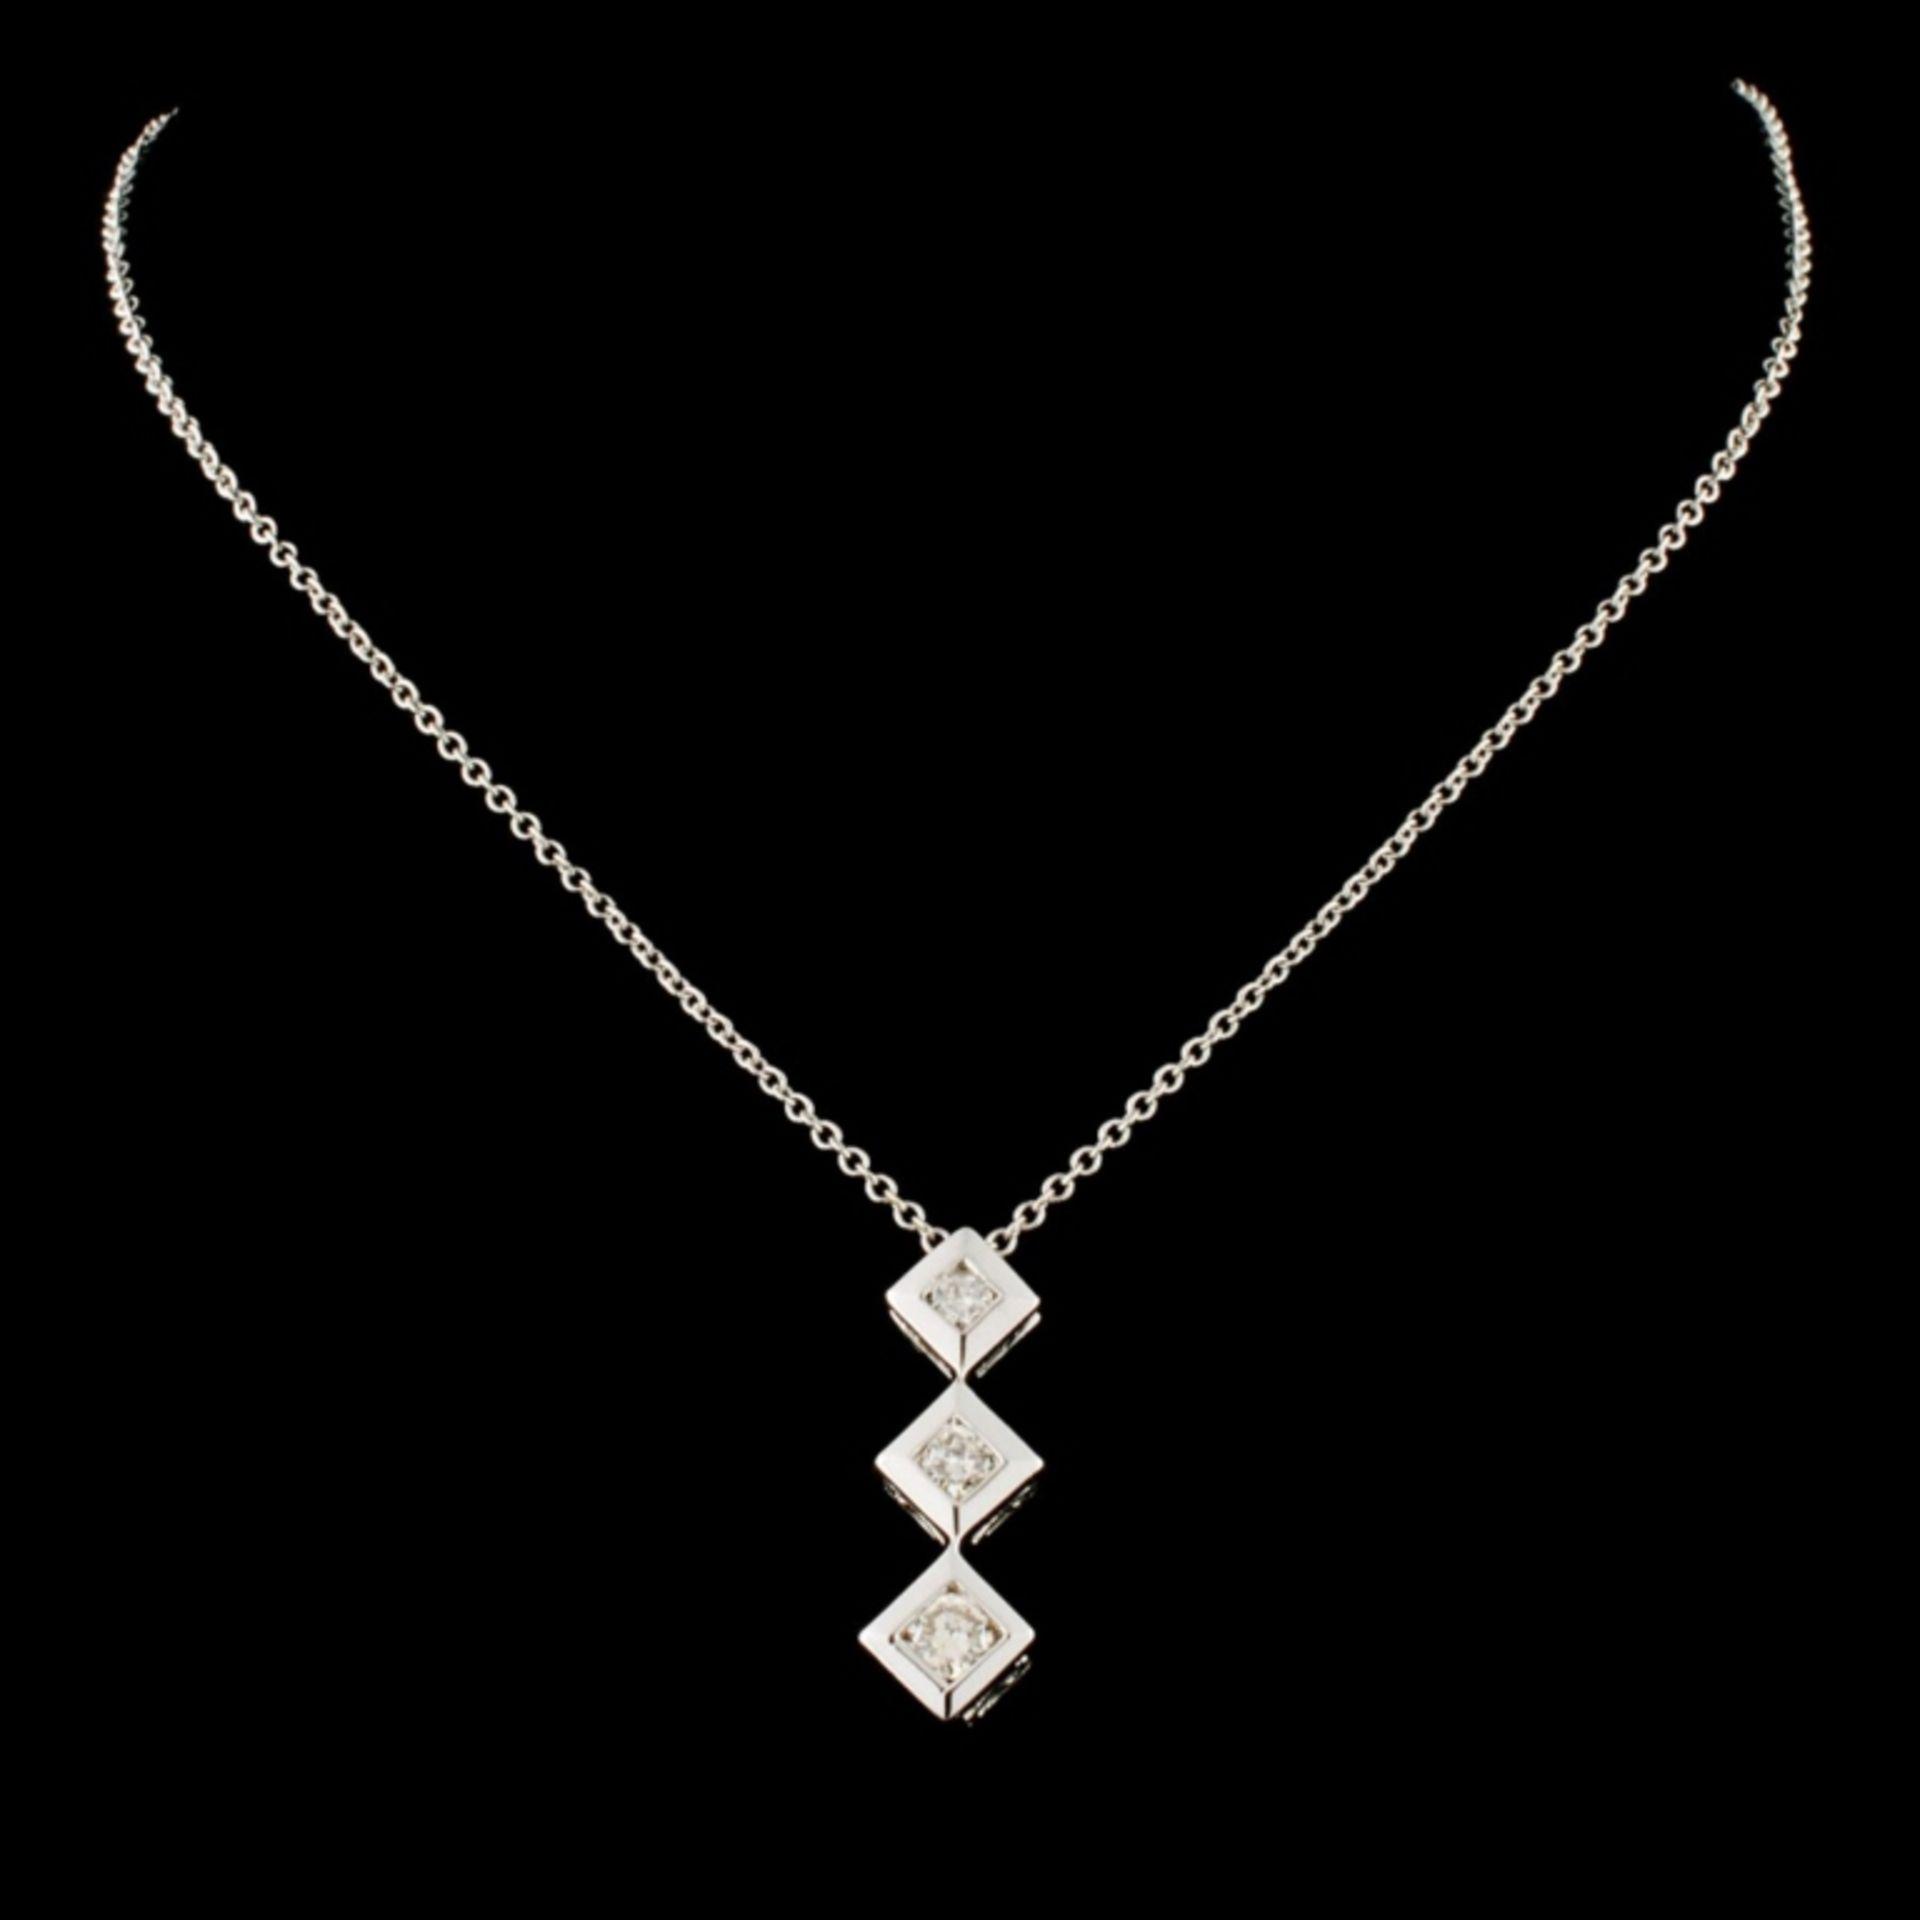 14K Gold 0.25ctw Diamond Pendant